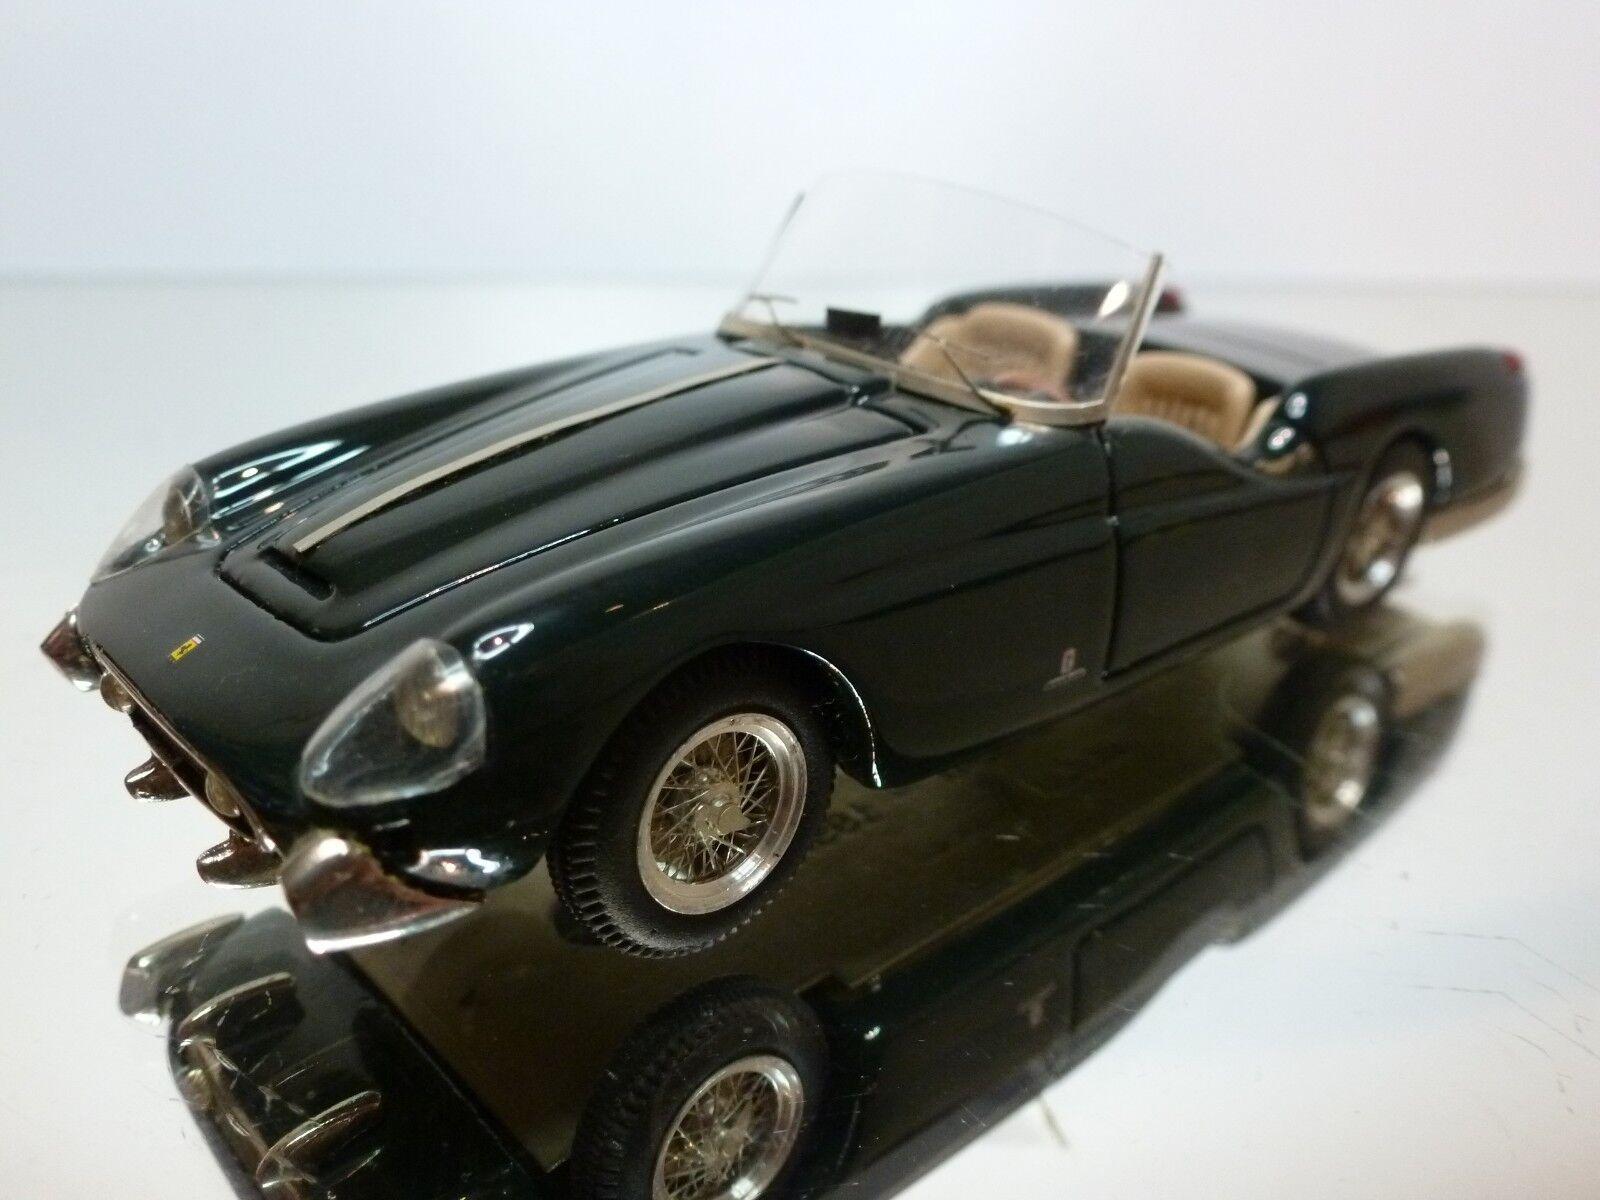 ABC BRIANZA 216 FERRARI 250 GT COLLINS 1957 GREN 1 43 EXCELLENT 7  8